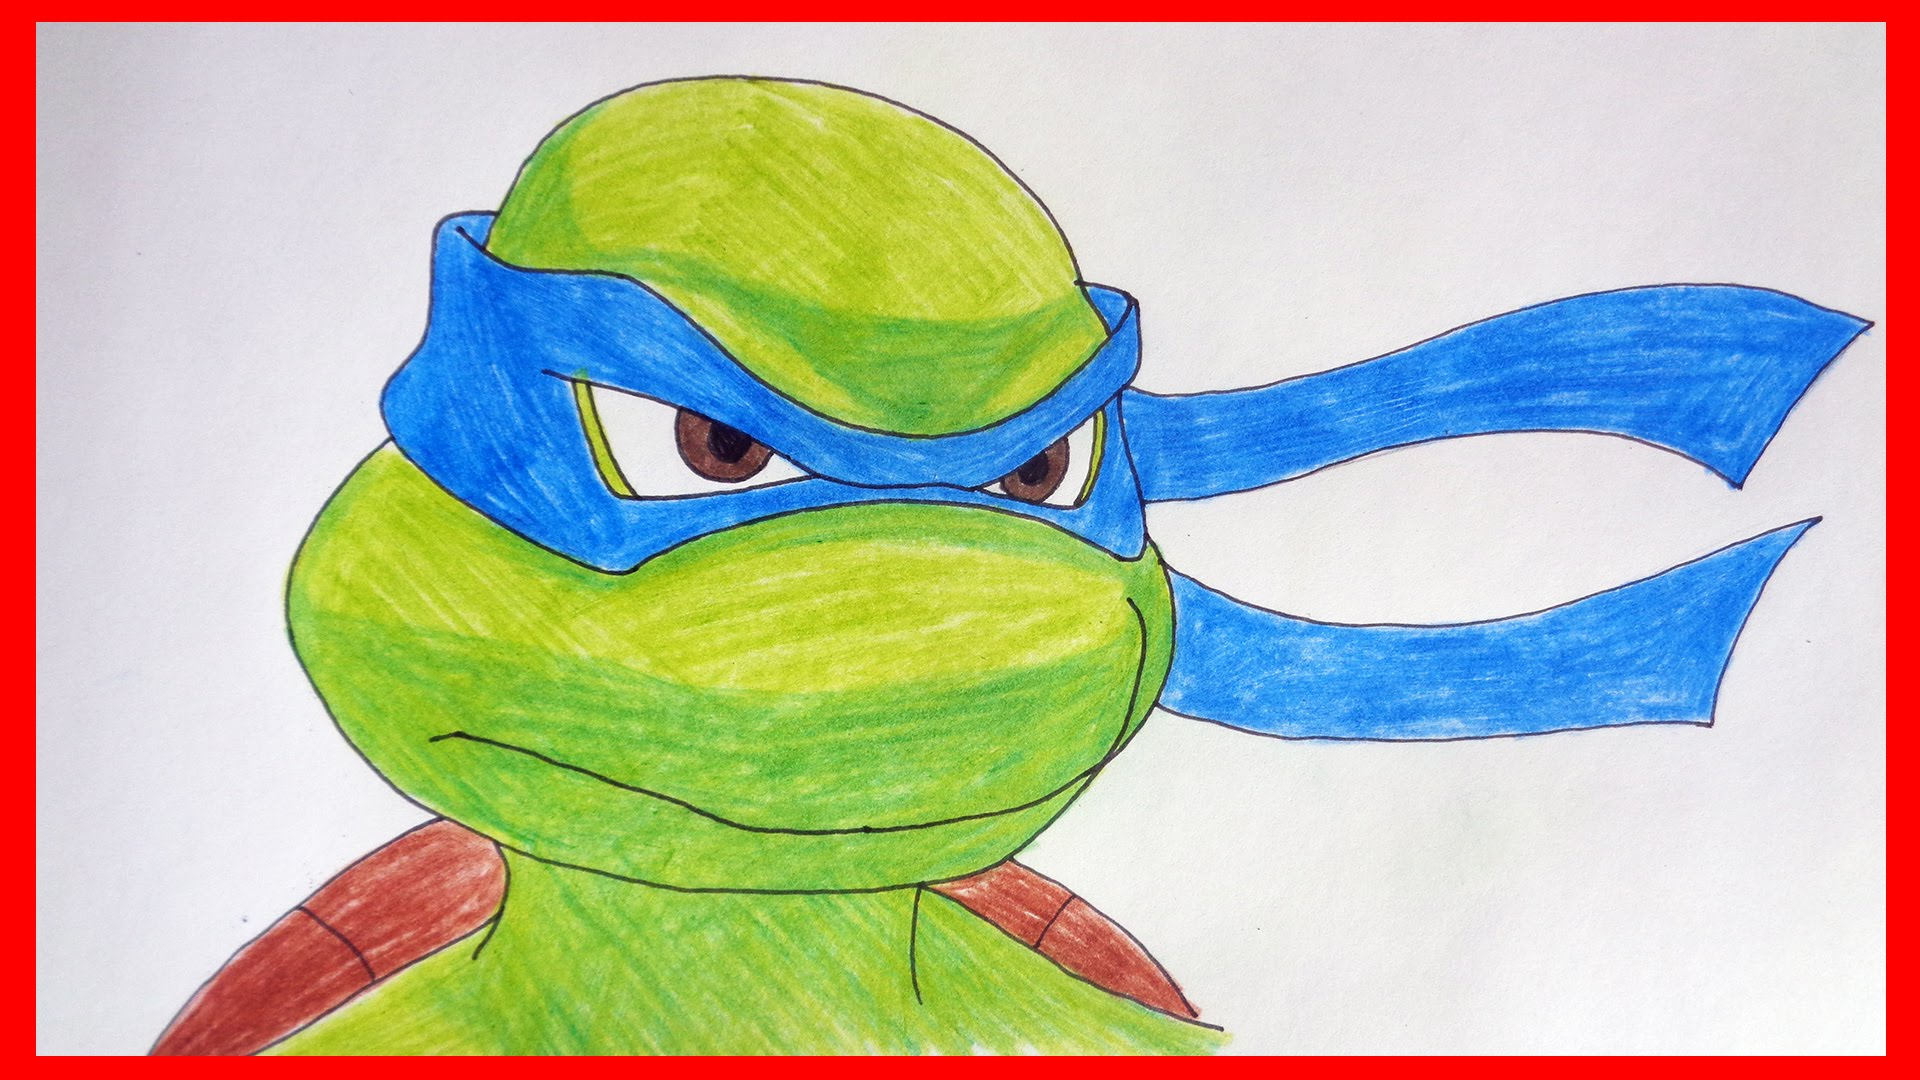 leonardo ninja turtle drawing at getdrawings com free for personal